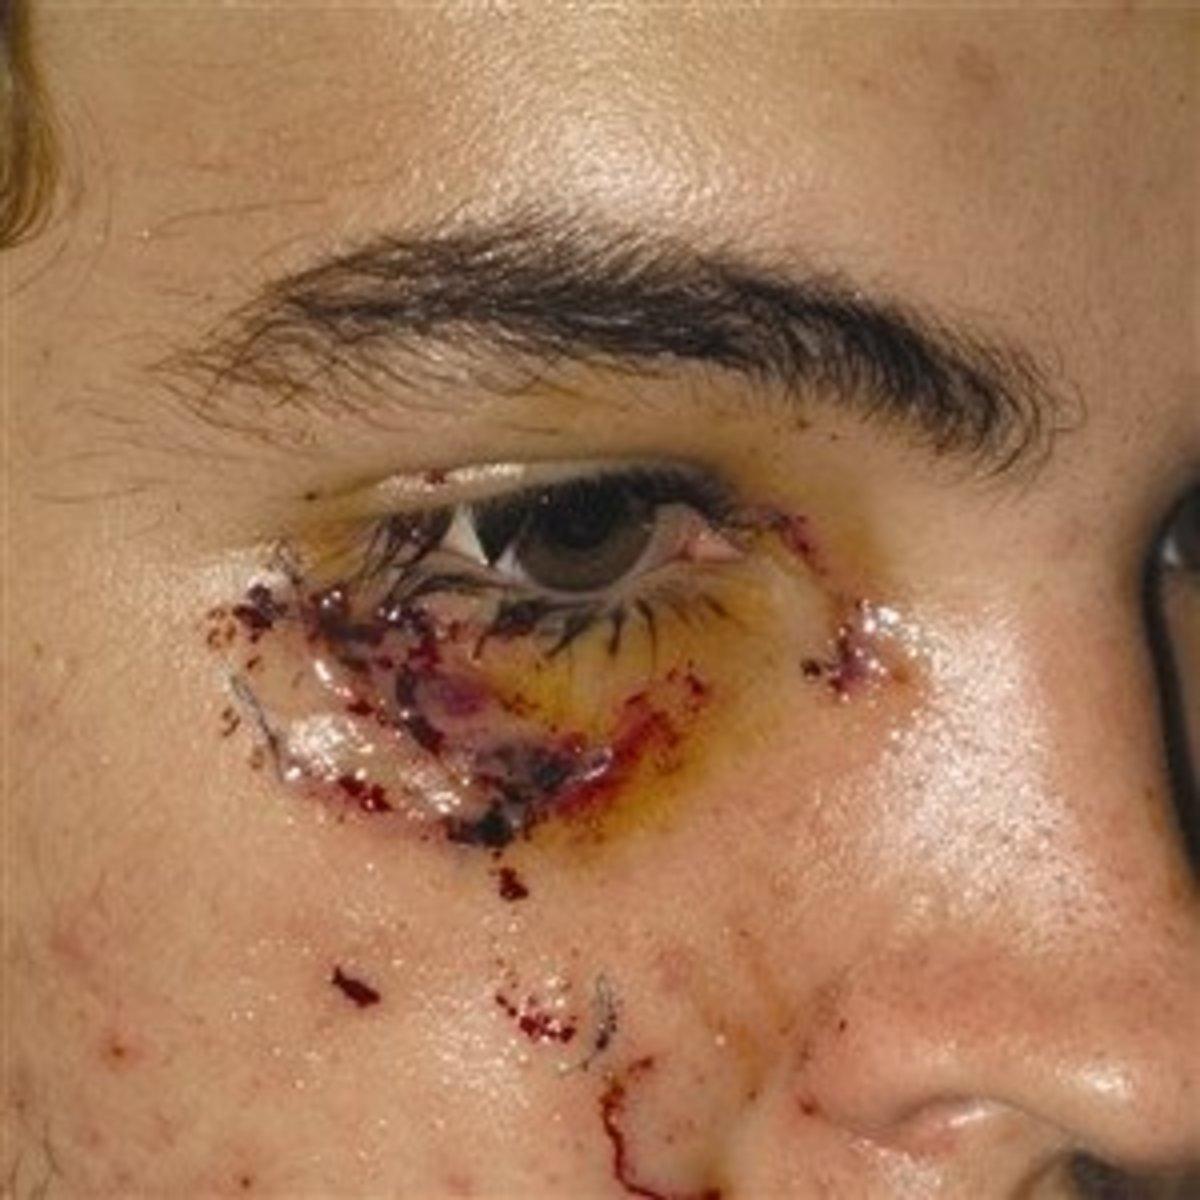 MRSA infection around the eye